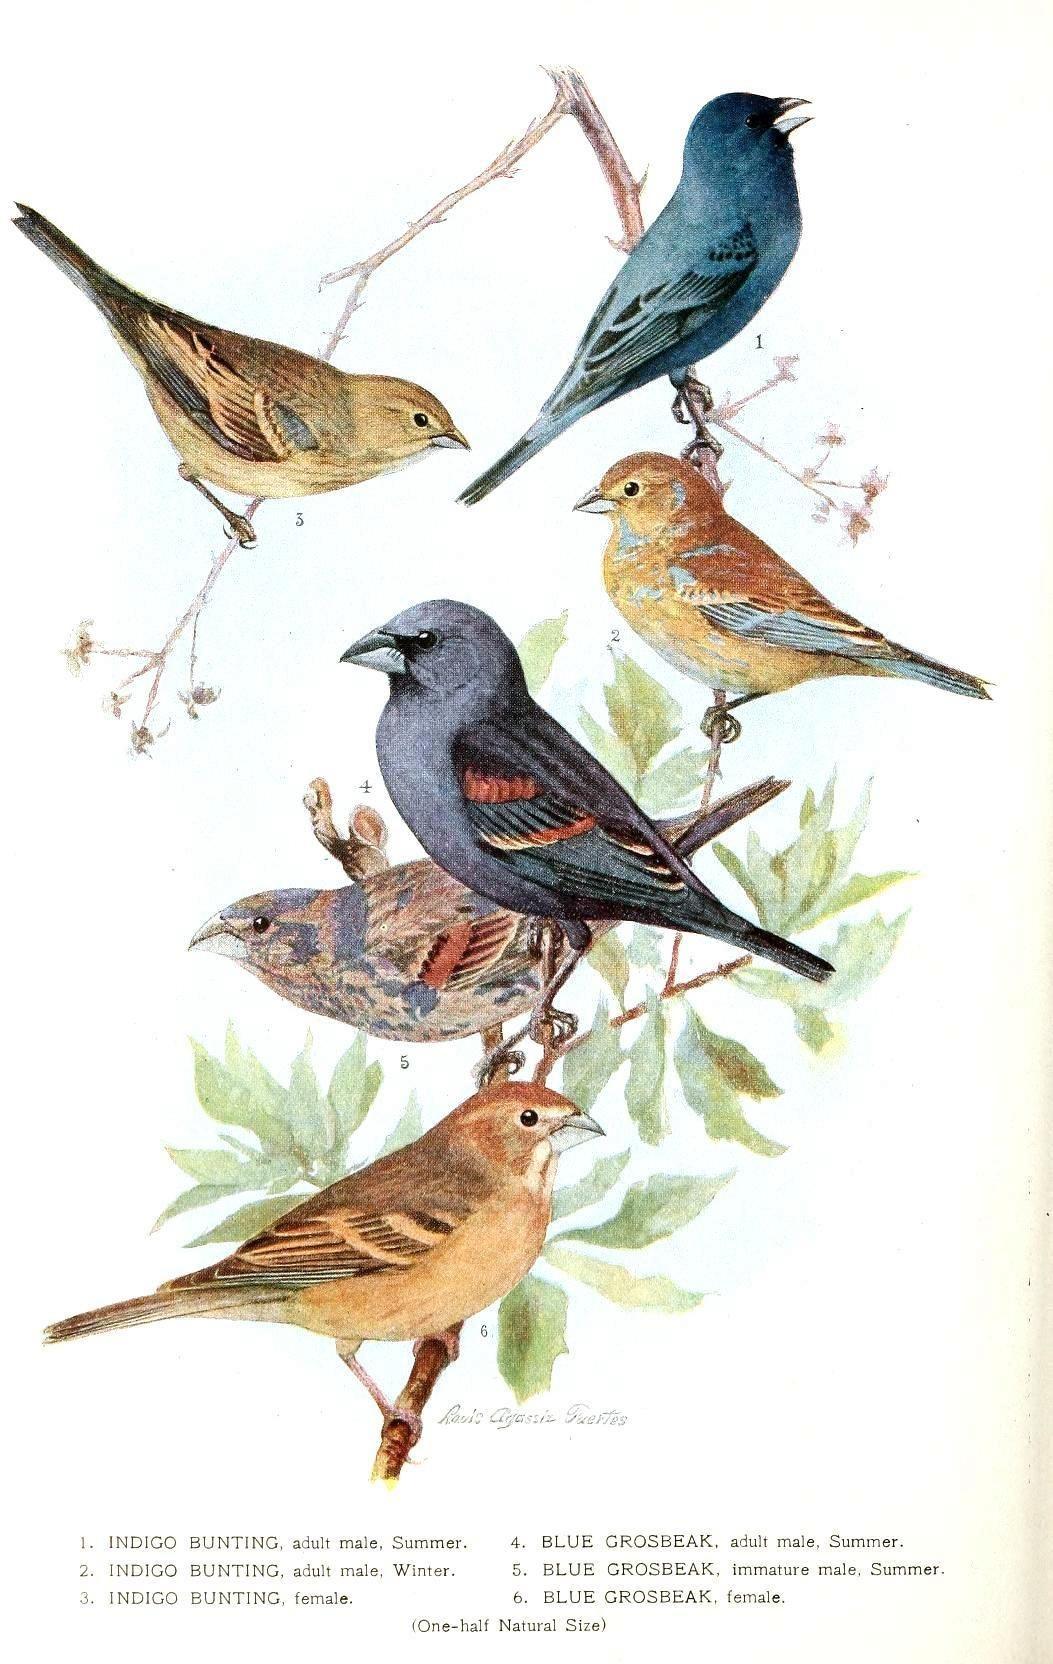 Free Printable - Bird - Indigo Grossbeak   Birds & Cages   Vintage - Free Printable Images Of Birds